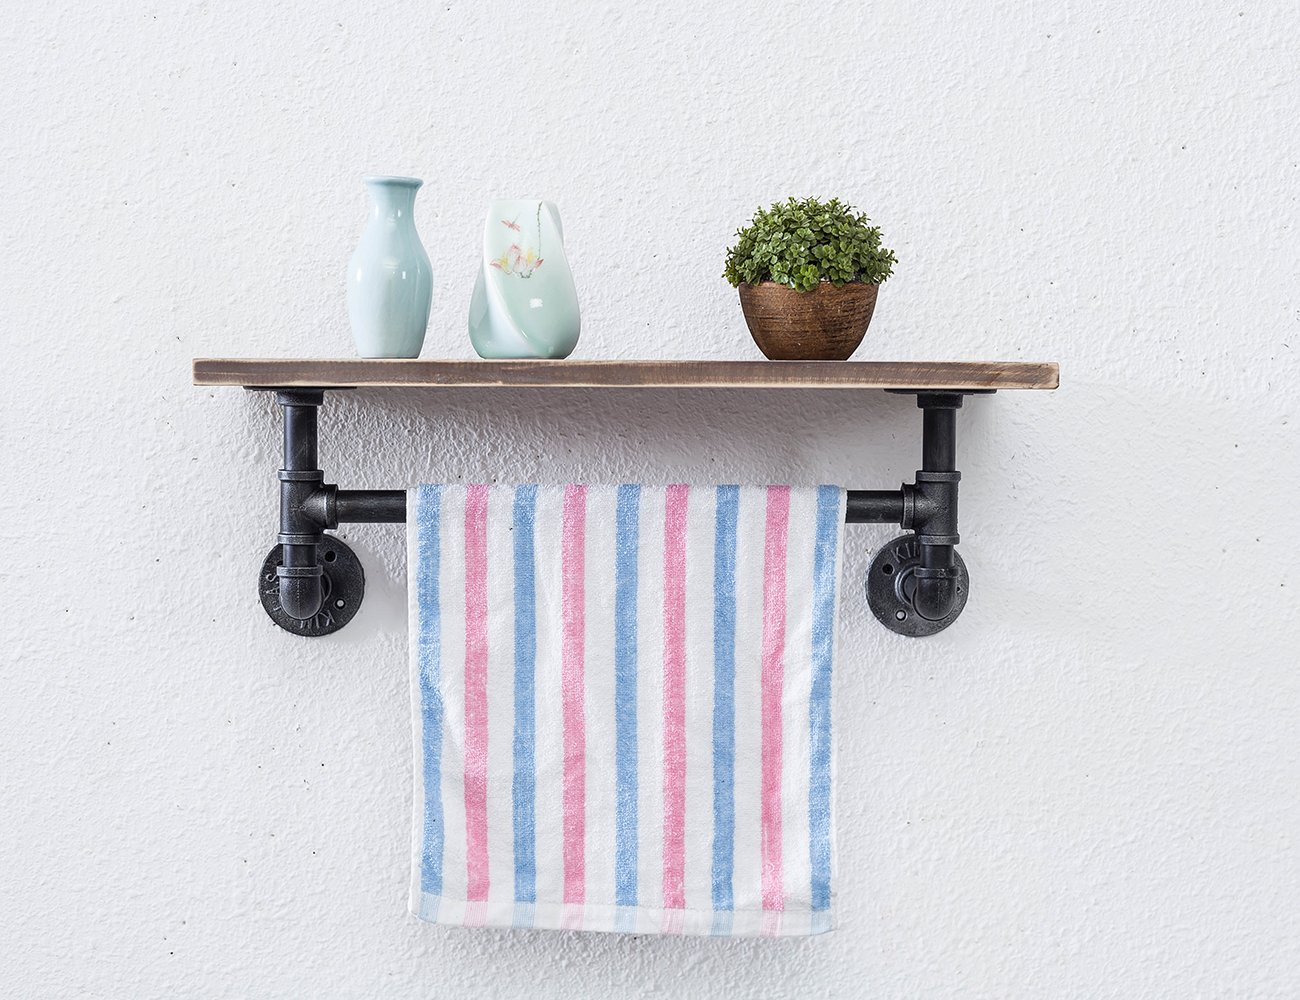 Industrial Pipe Towel Racks Wood shelves Wall Mounted 24-Inch Shelf ...